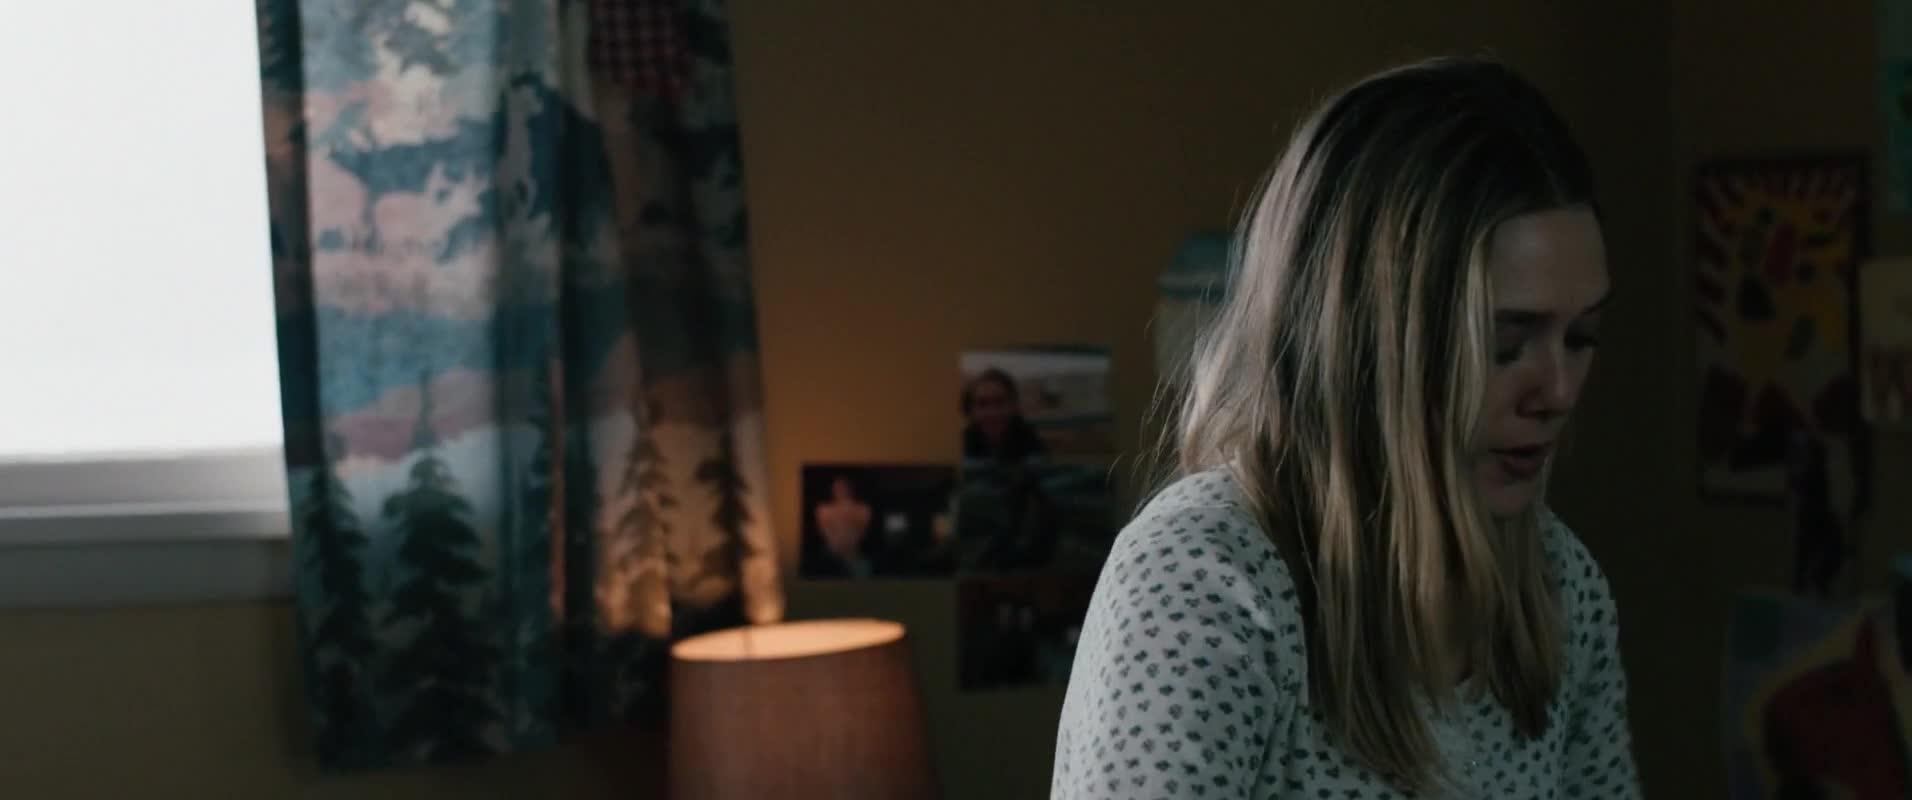 Elizabeth Olsen scene from wind river